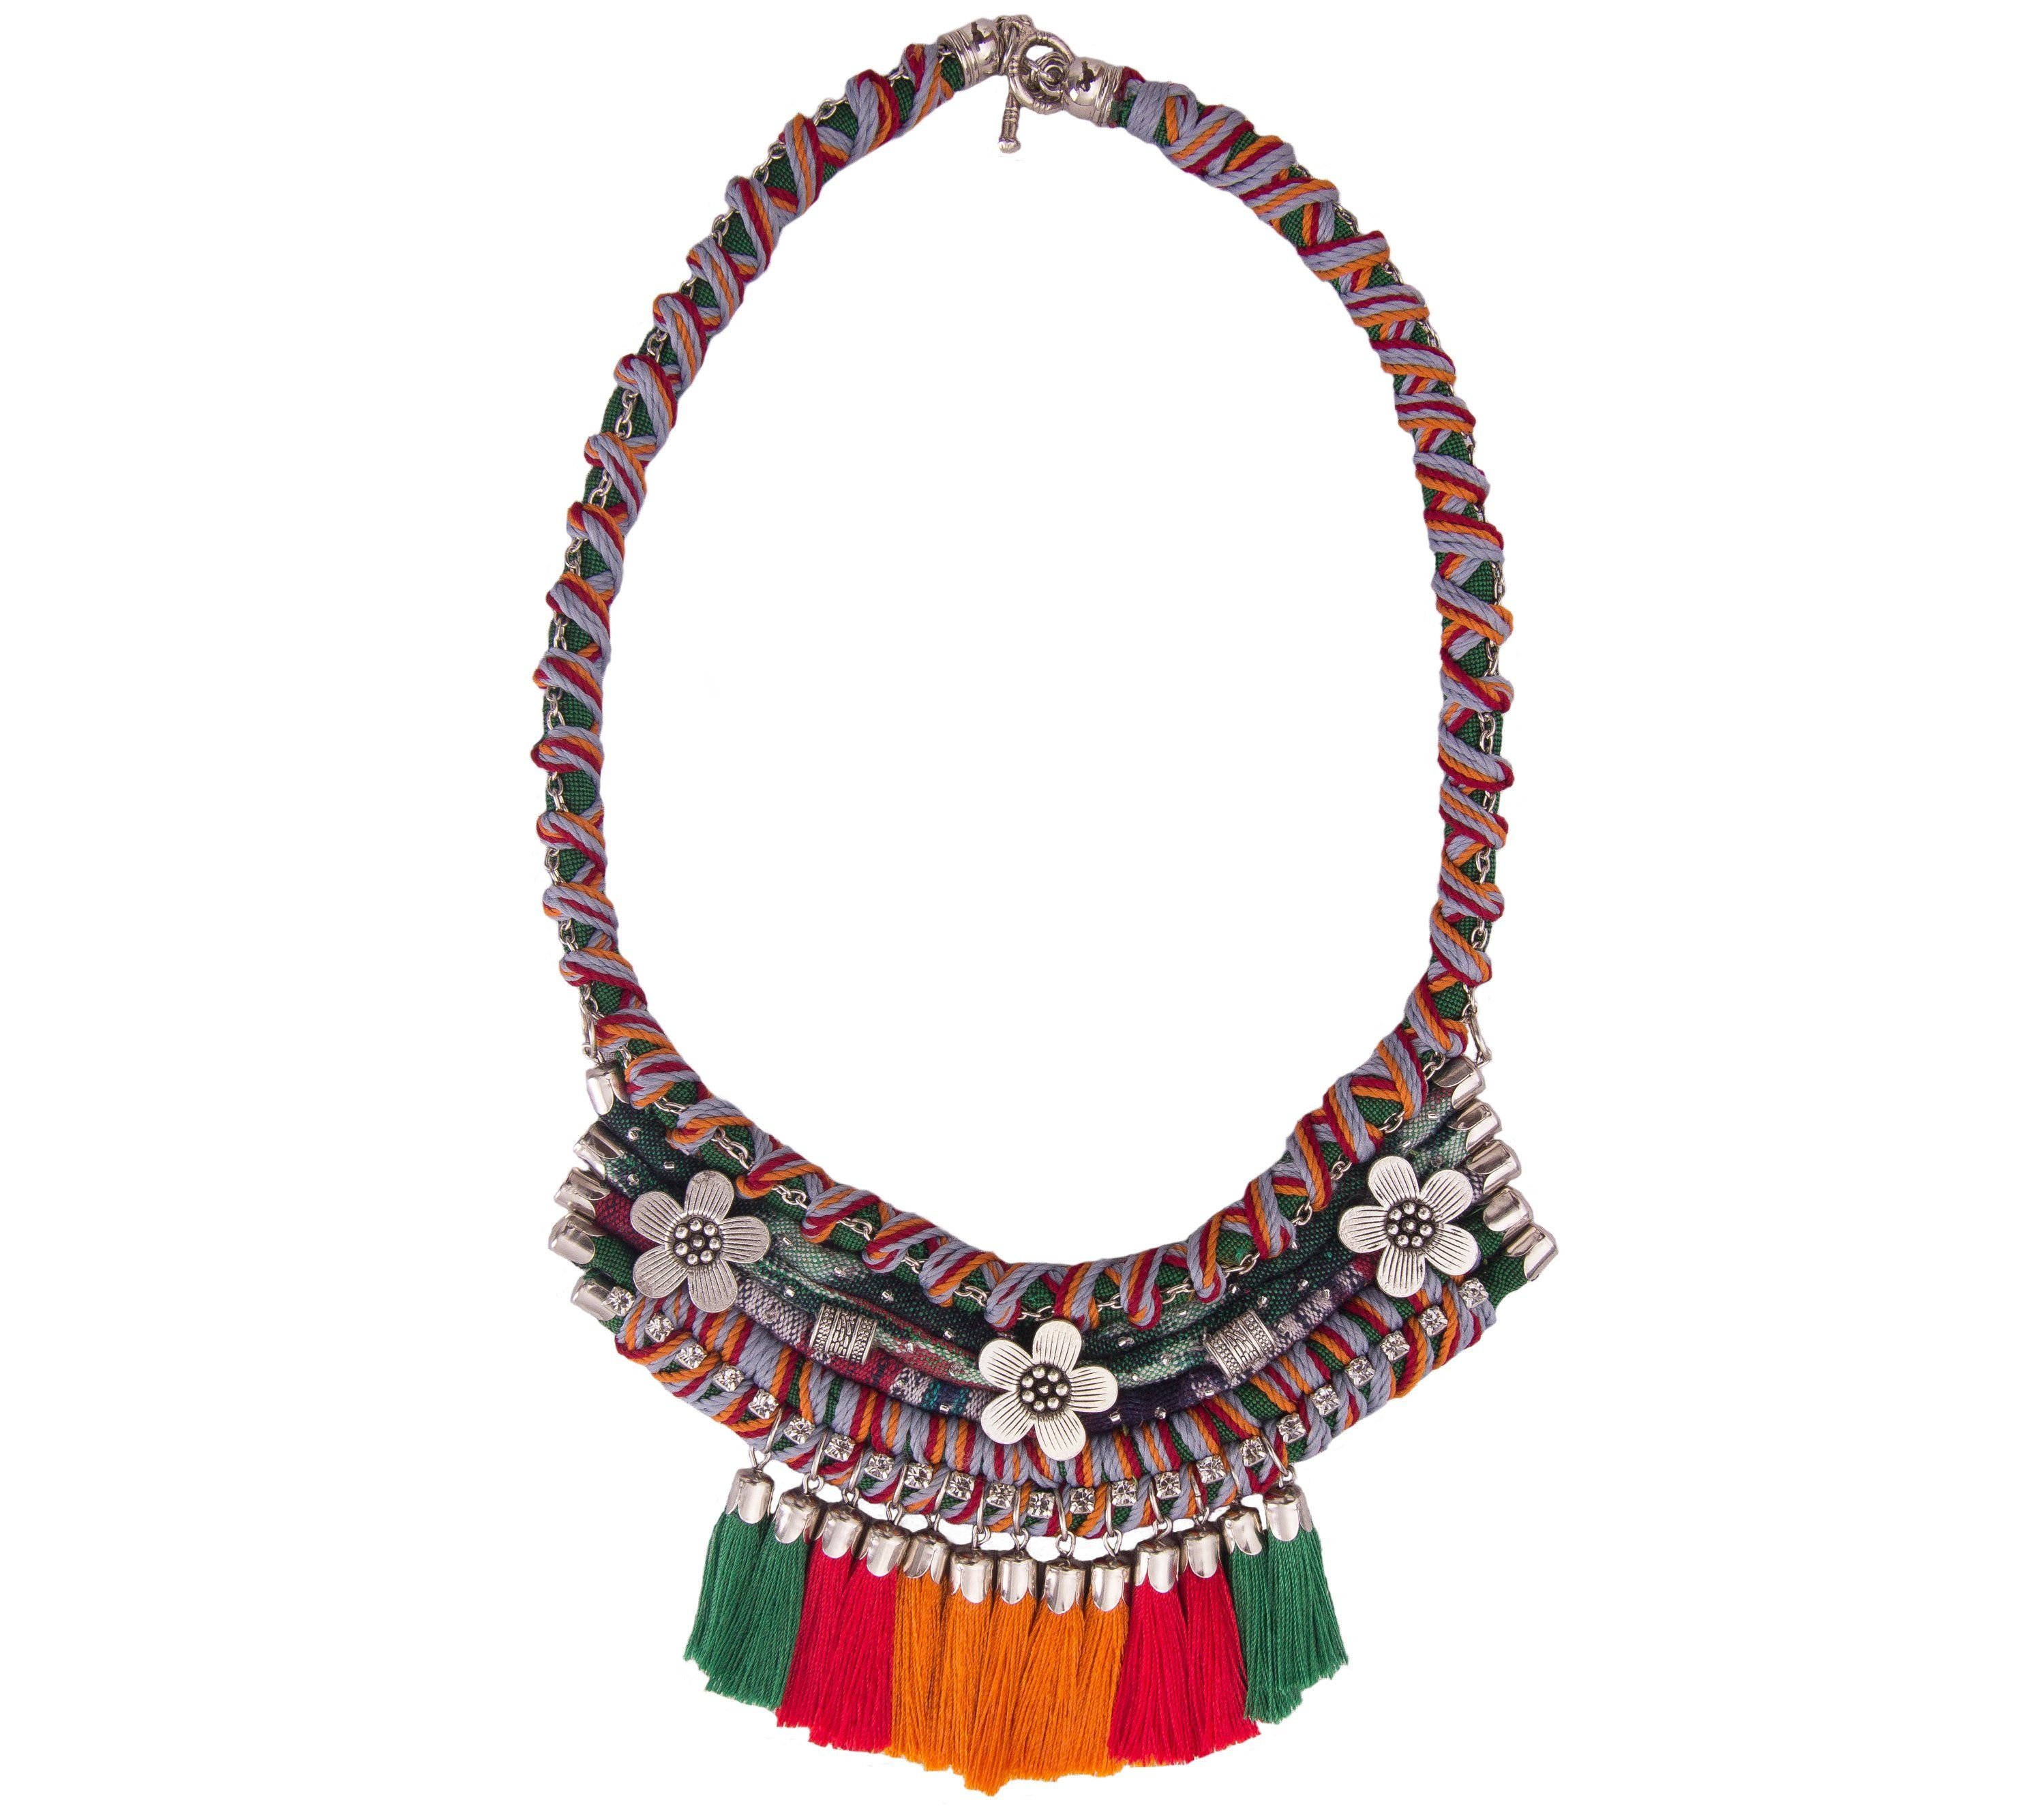 Cemara Necklace